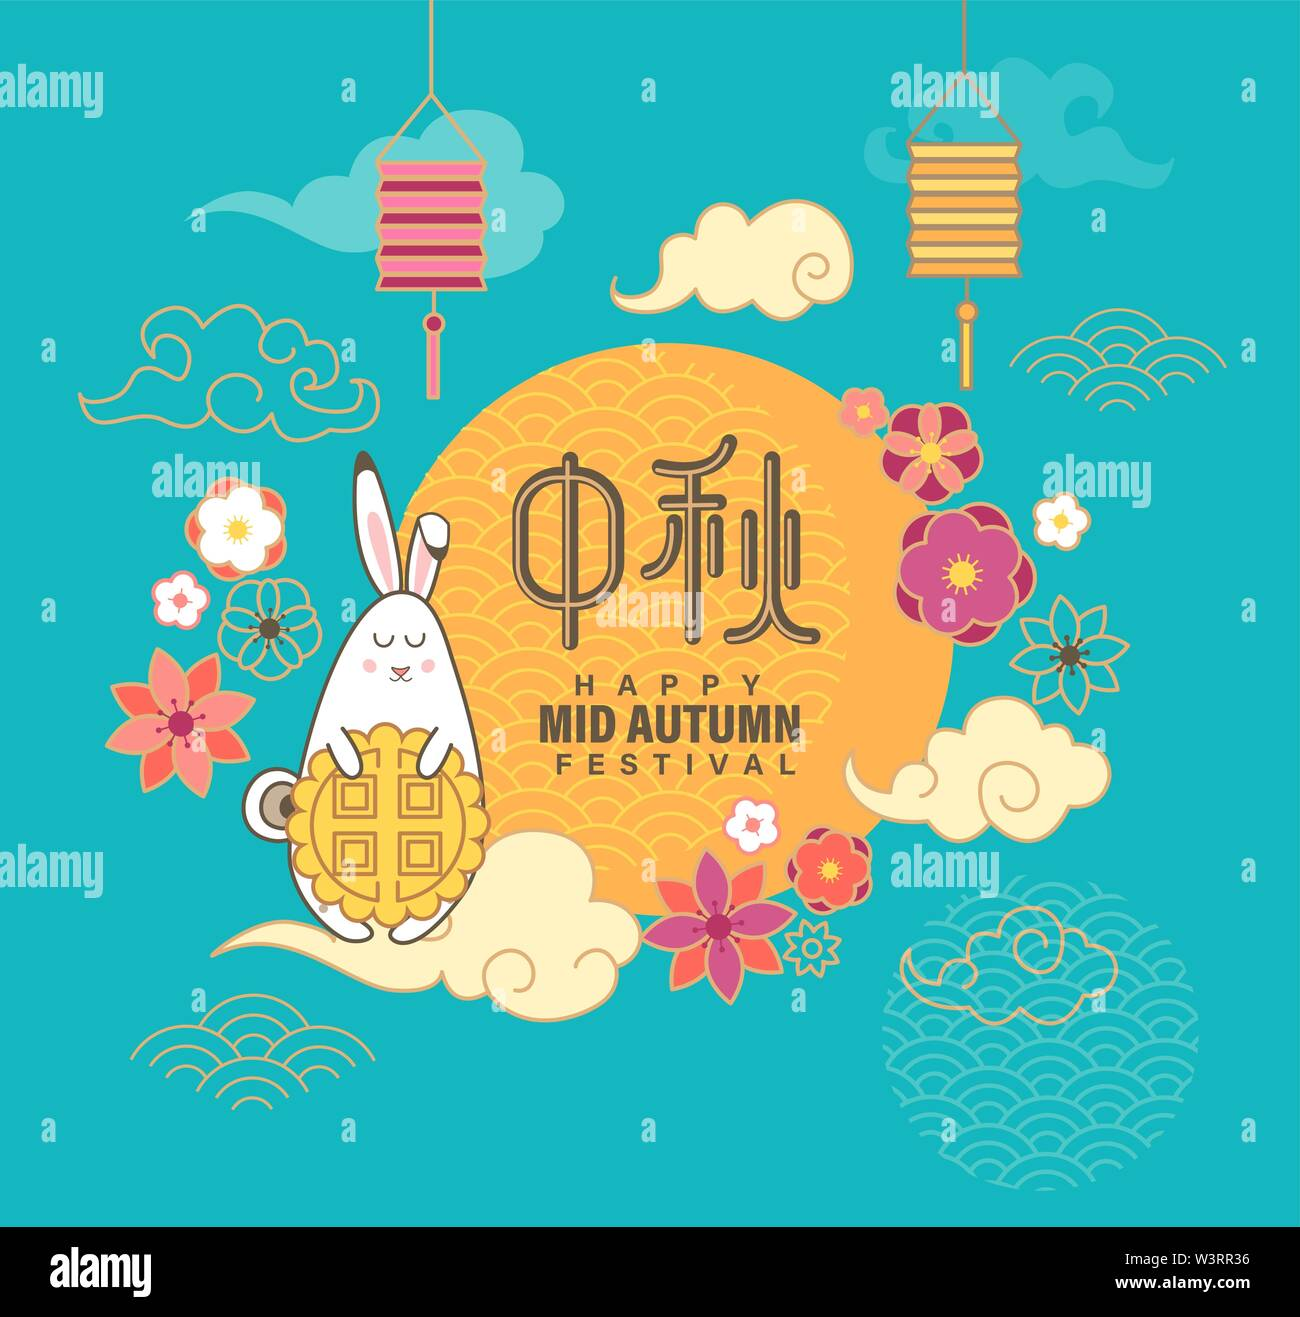 Mid Autumn Festival banner, card, flyer. - Stock Image